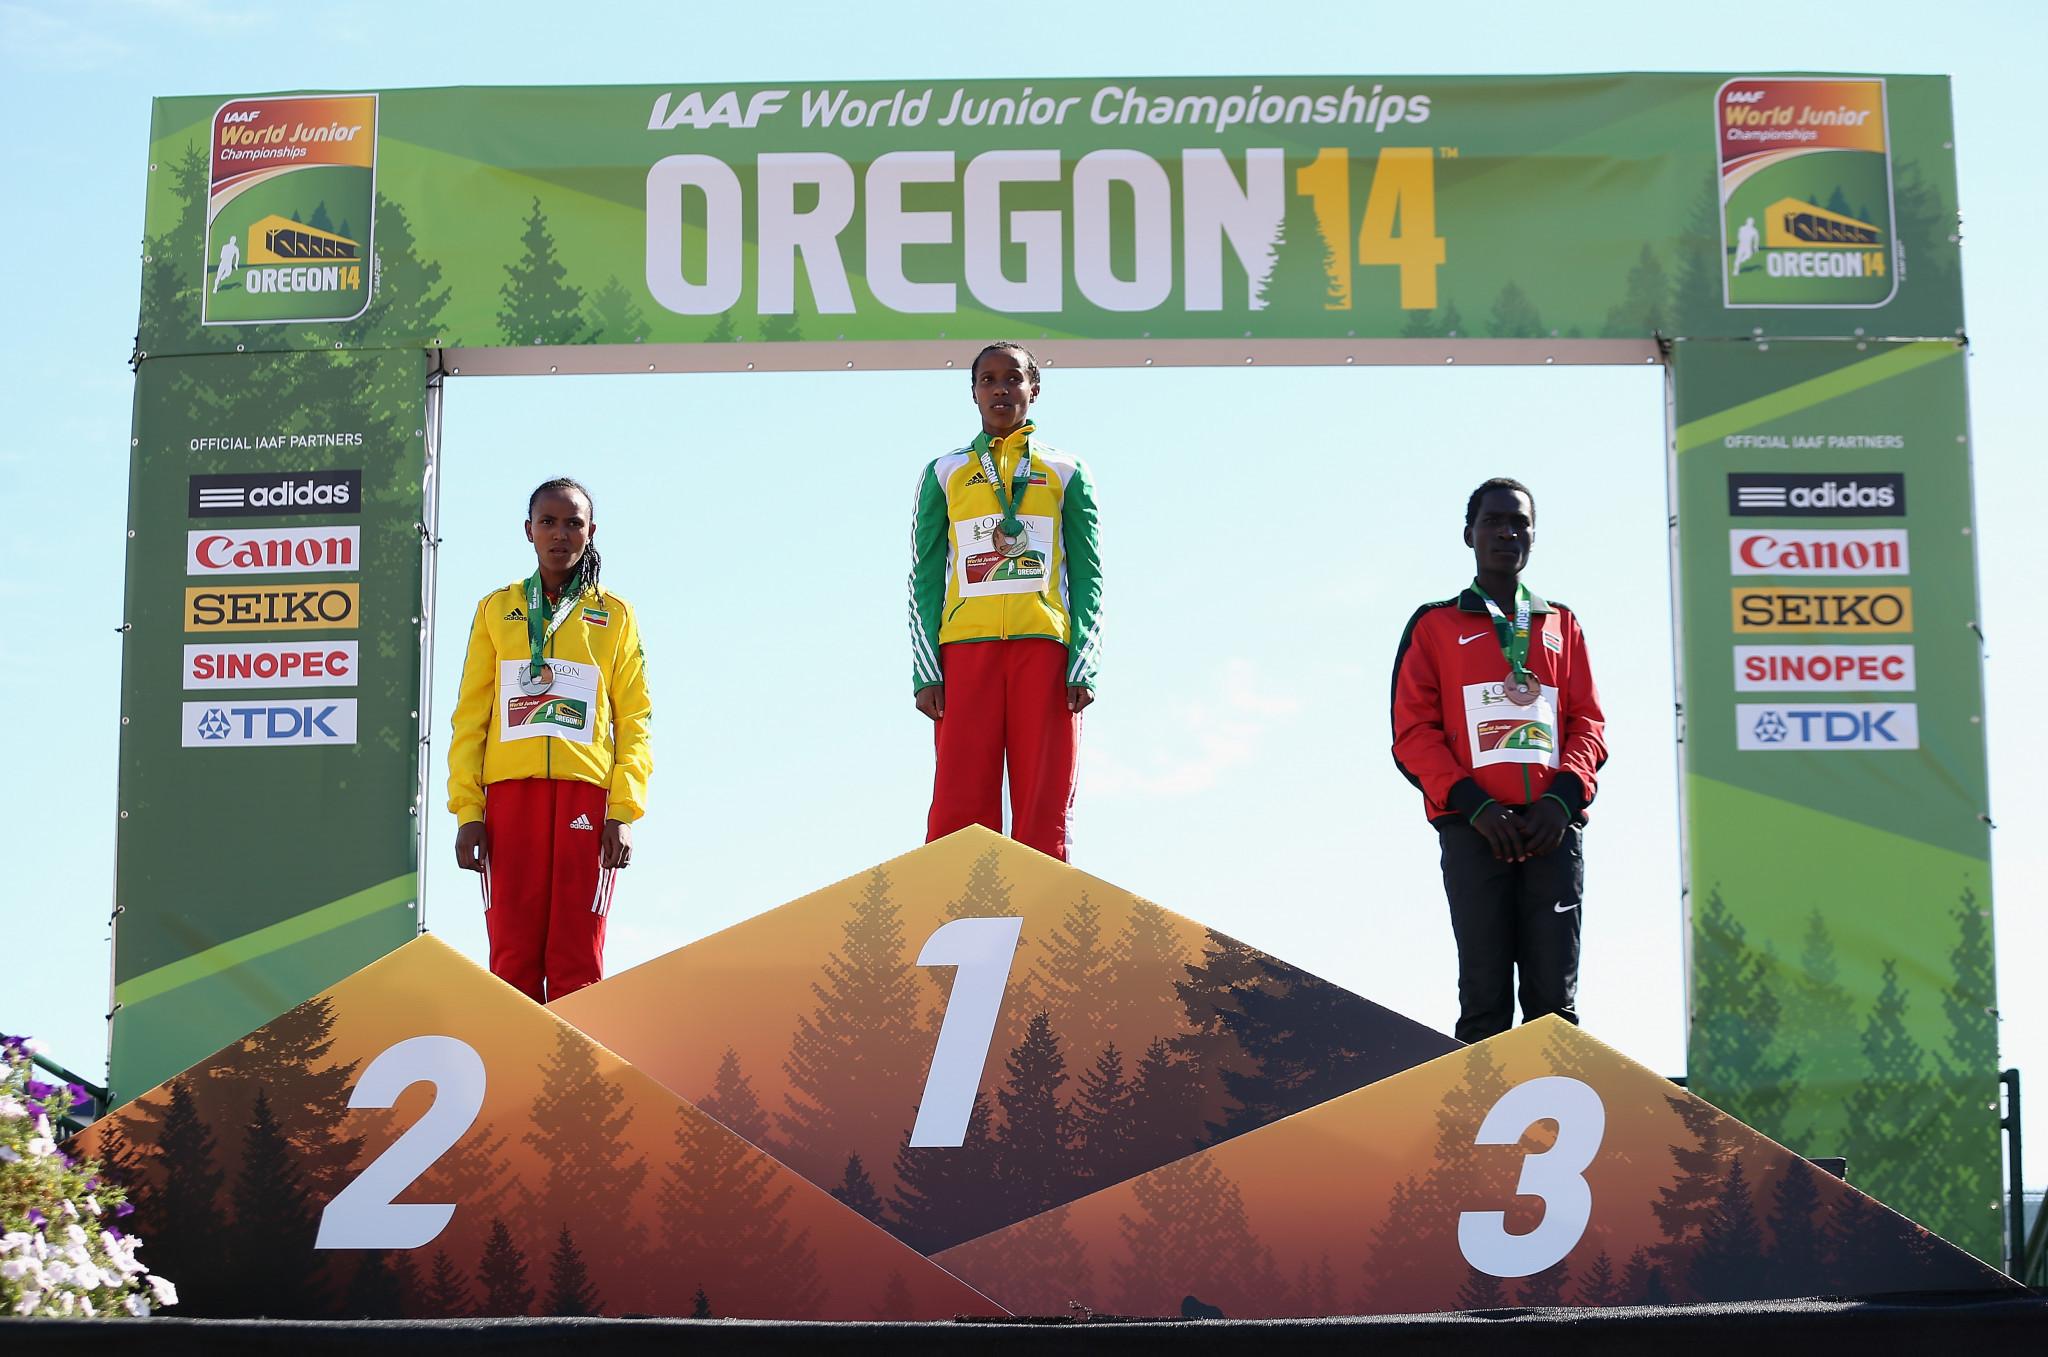 Athletics Kenya President pays tribute after 22-year-old runner dies